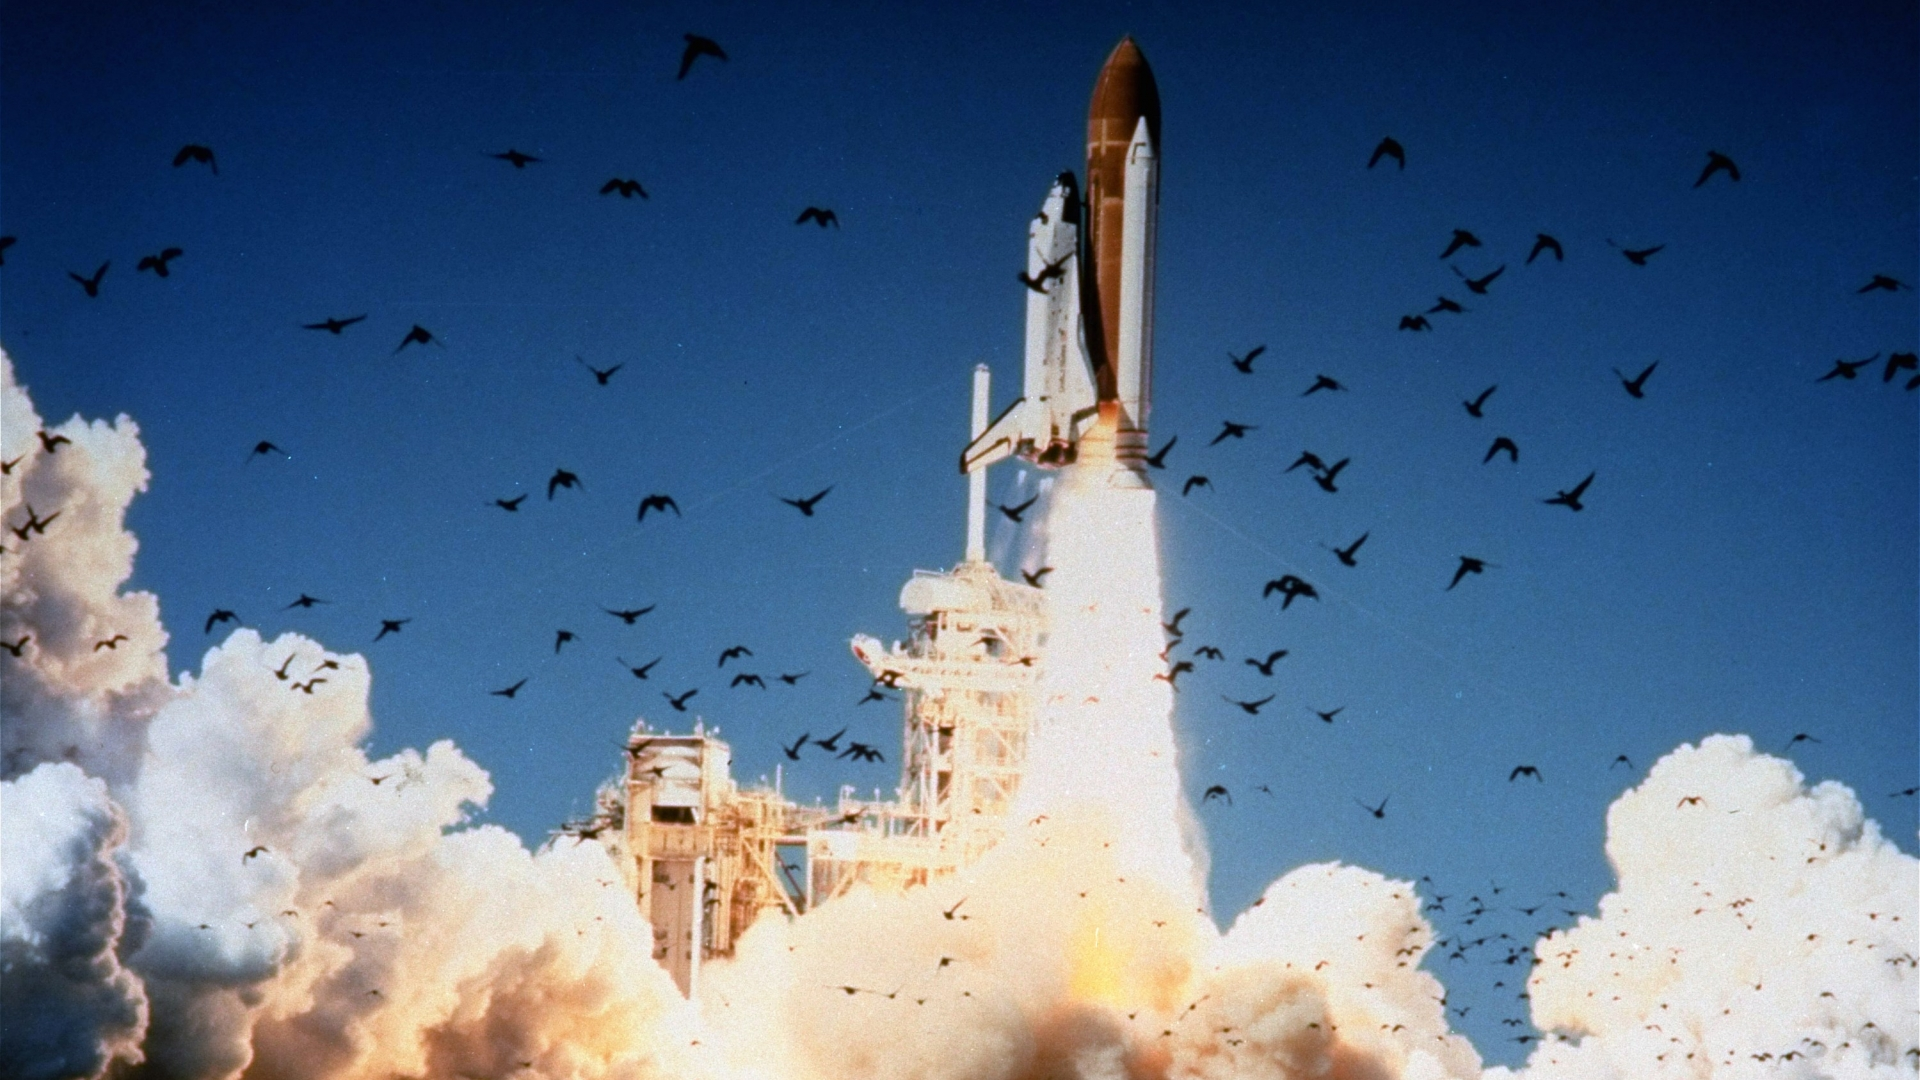 space shuttle challenger last transmission - photo #22